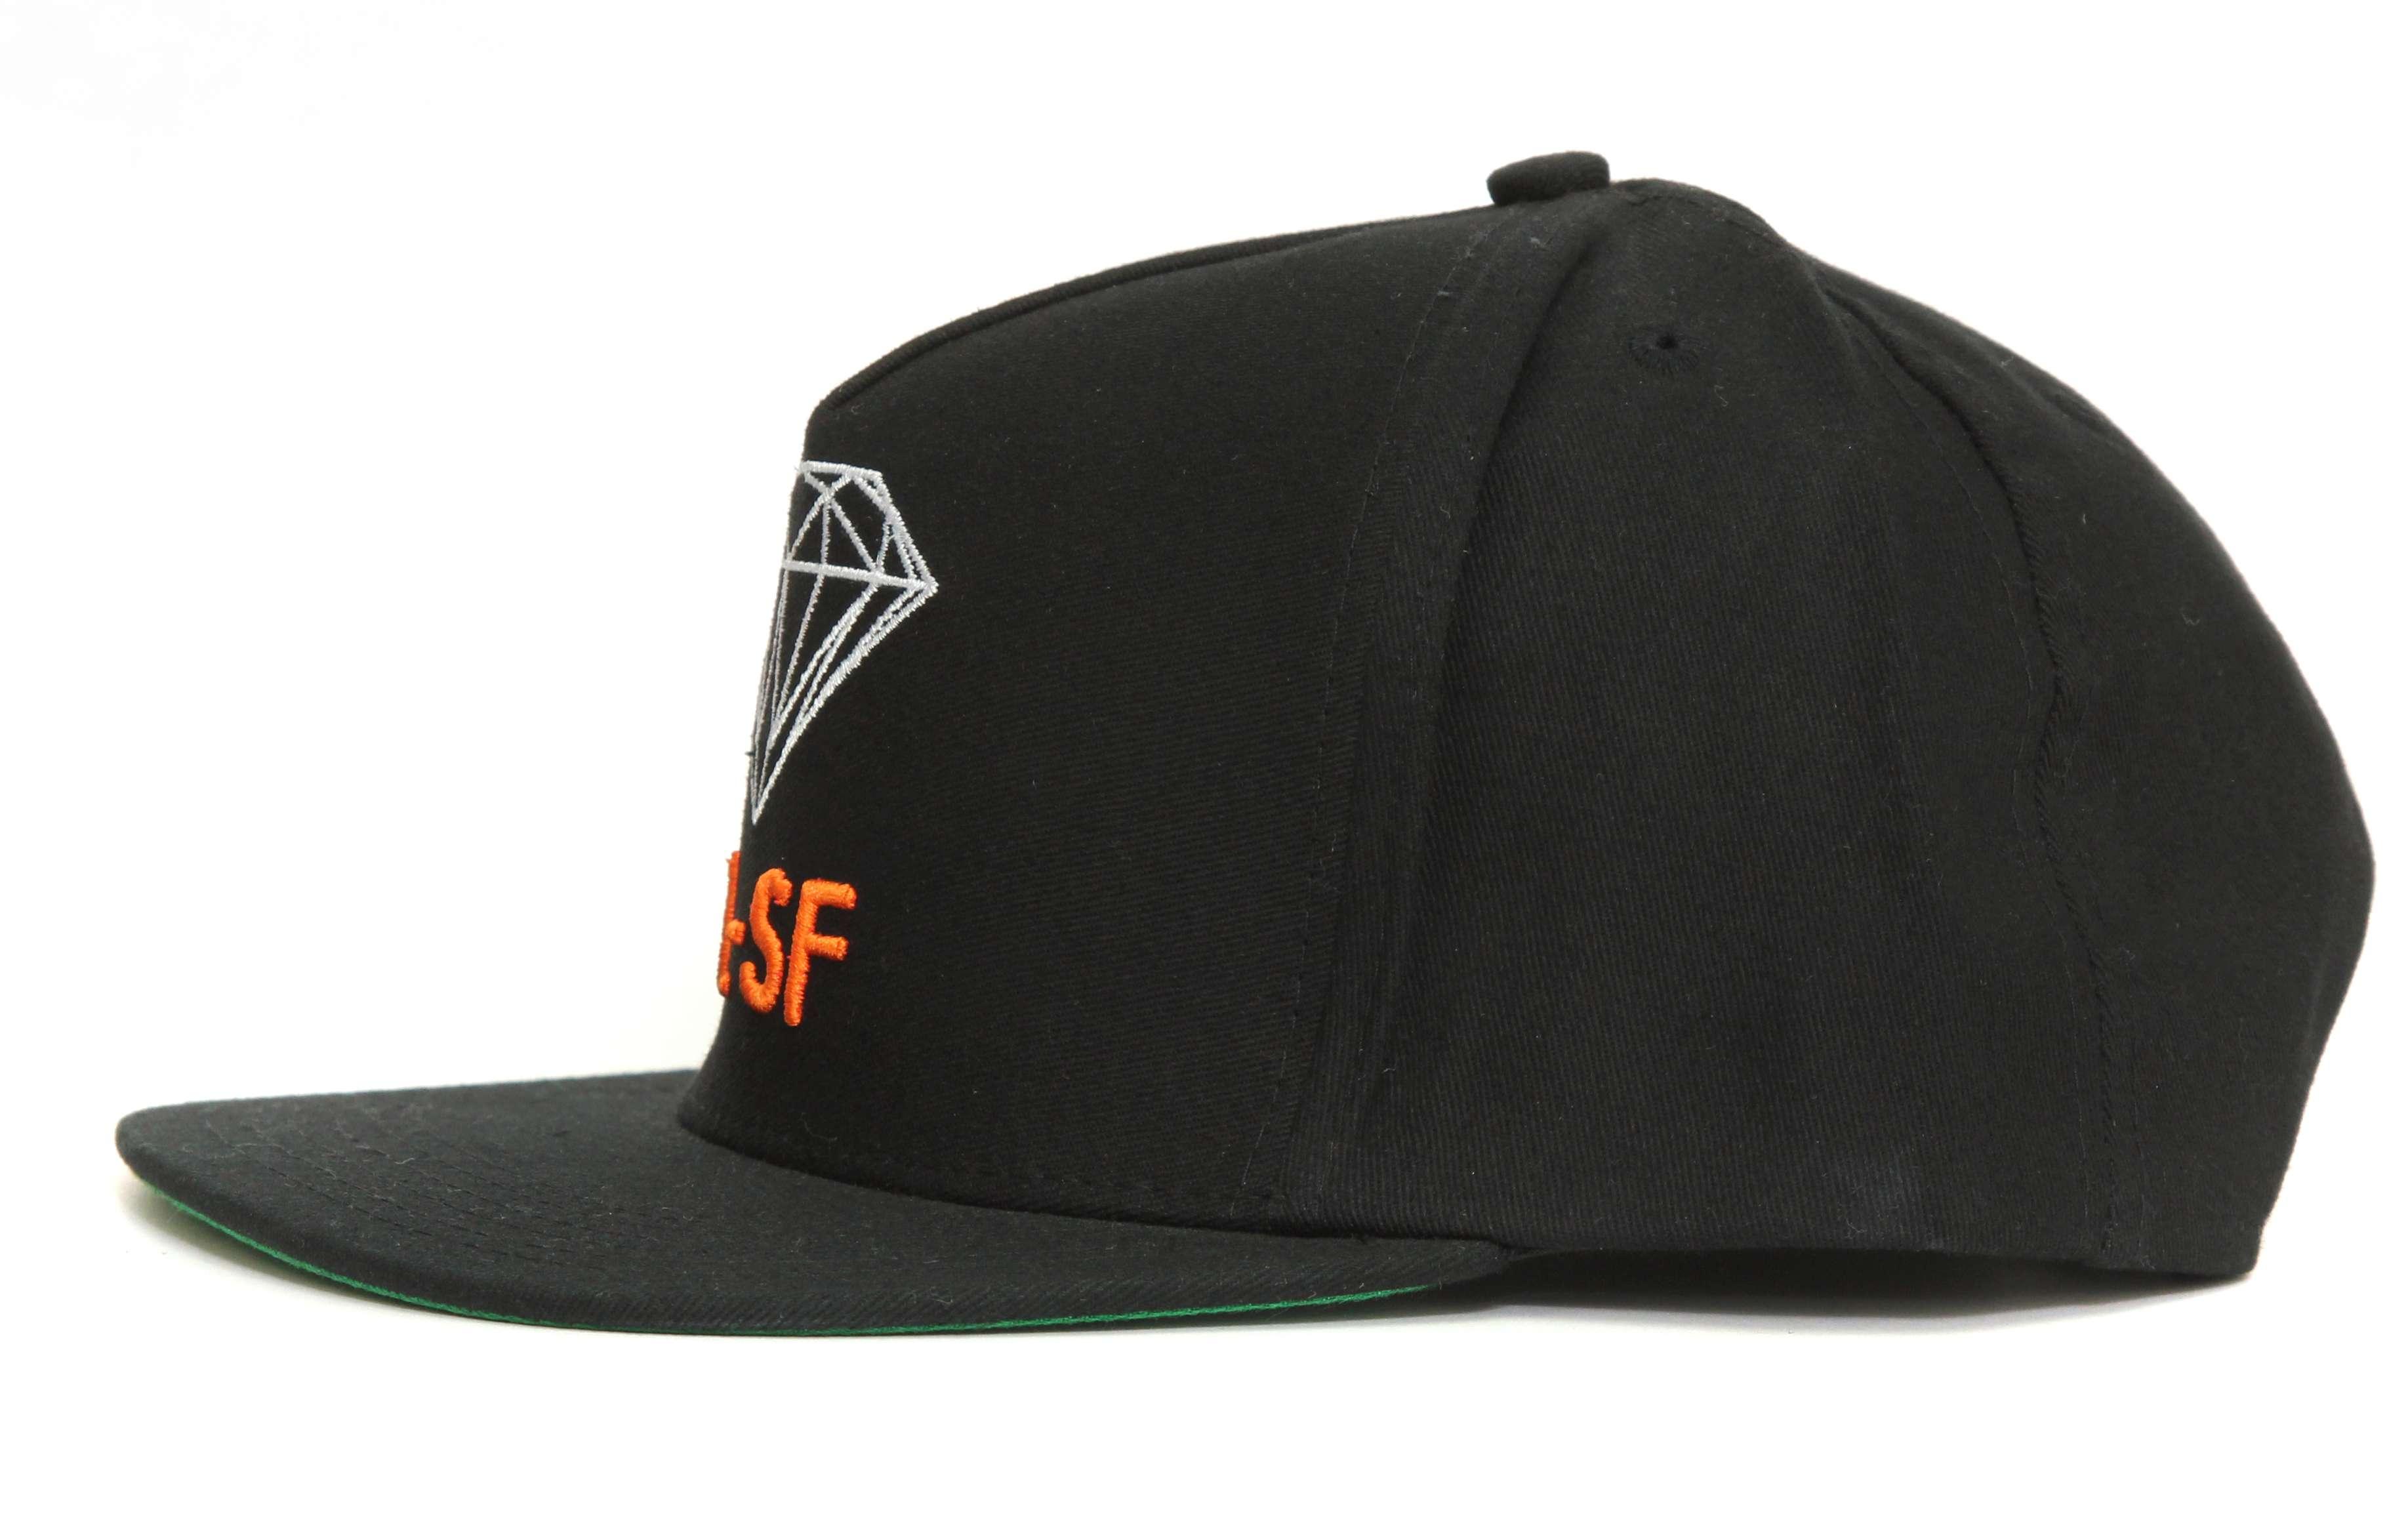 Men/'s DL-SF Snapback Hat Diamond Supply Co